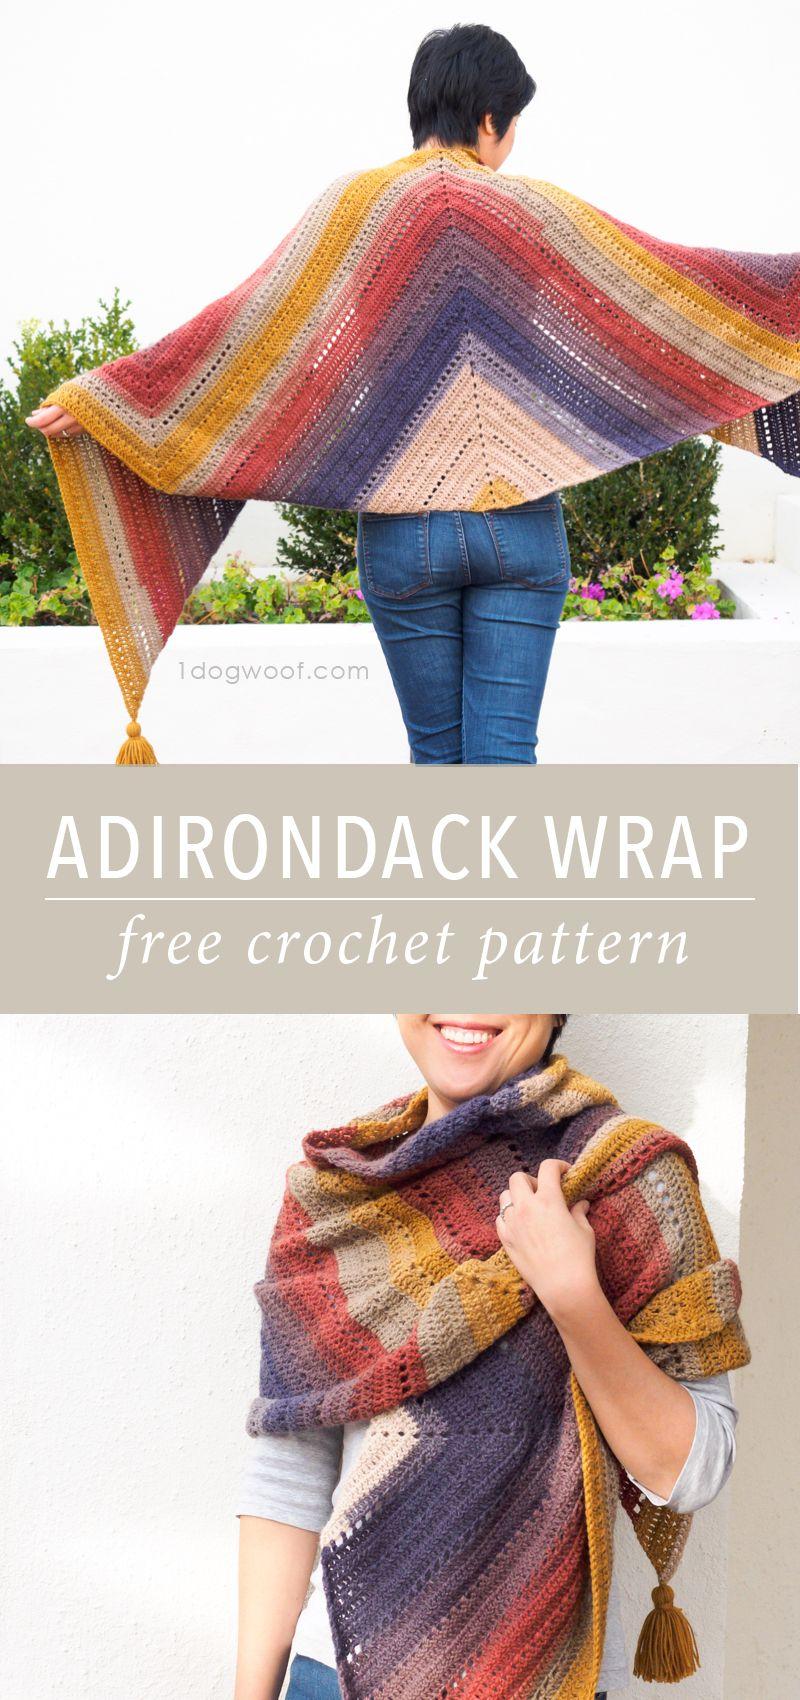 The Adirondack Wrap Crochet Pattern Diy Ideas Crochet Crochet